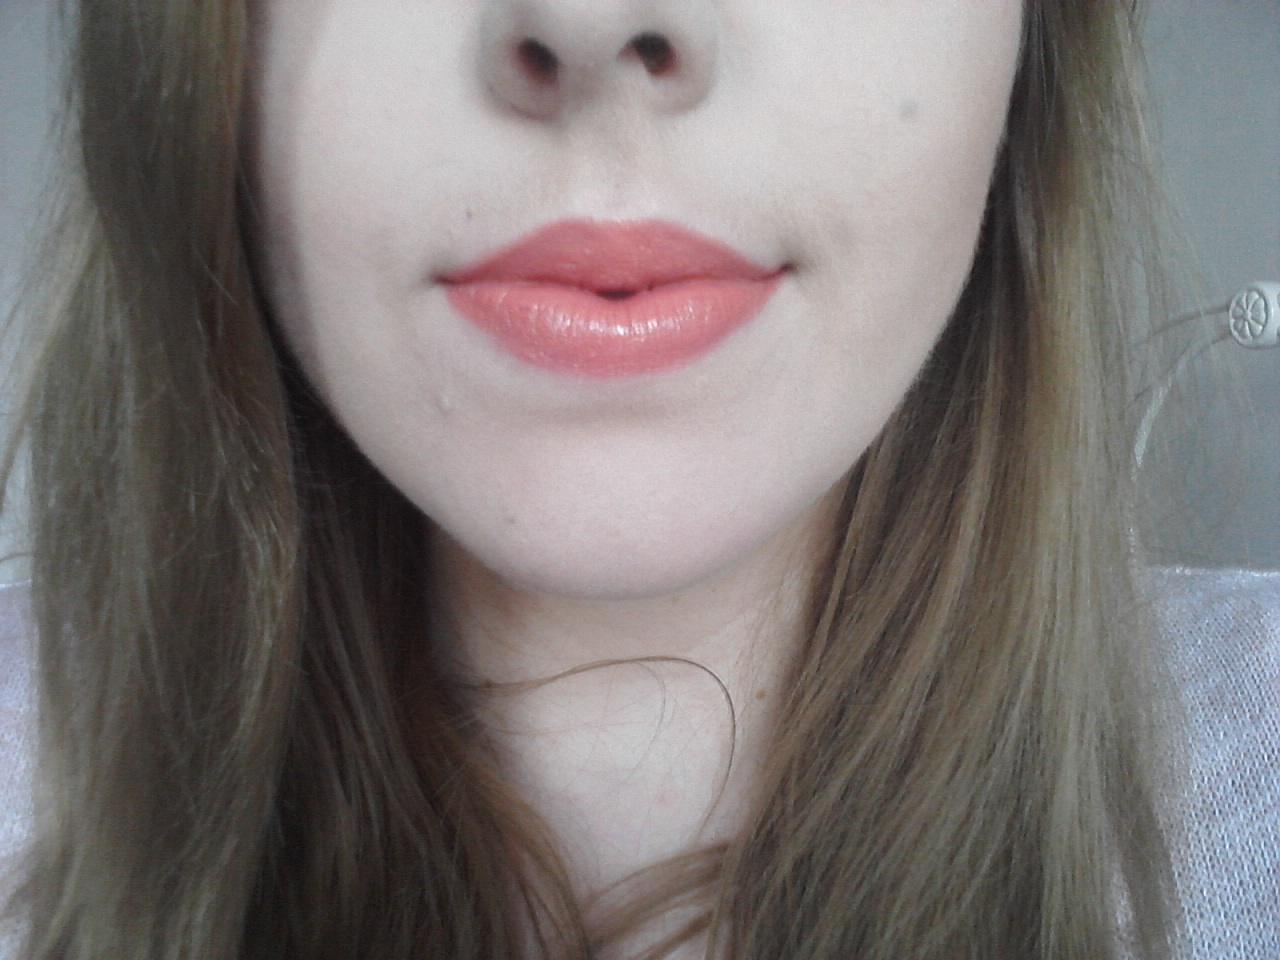 Love & Glamour: Lips of The Day #6: Mac Lipstick in Ravishing